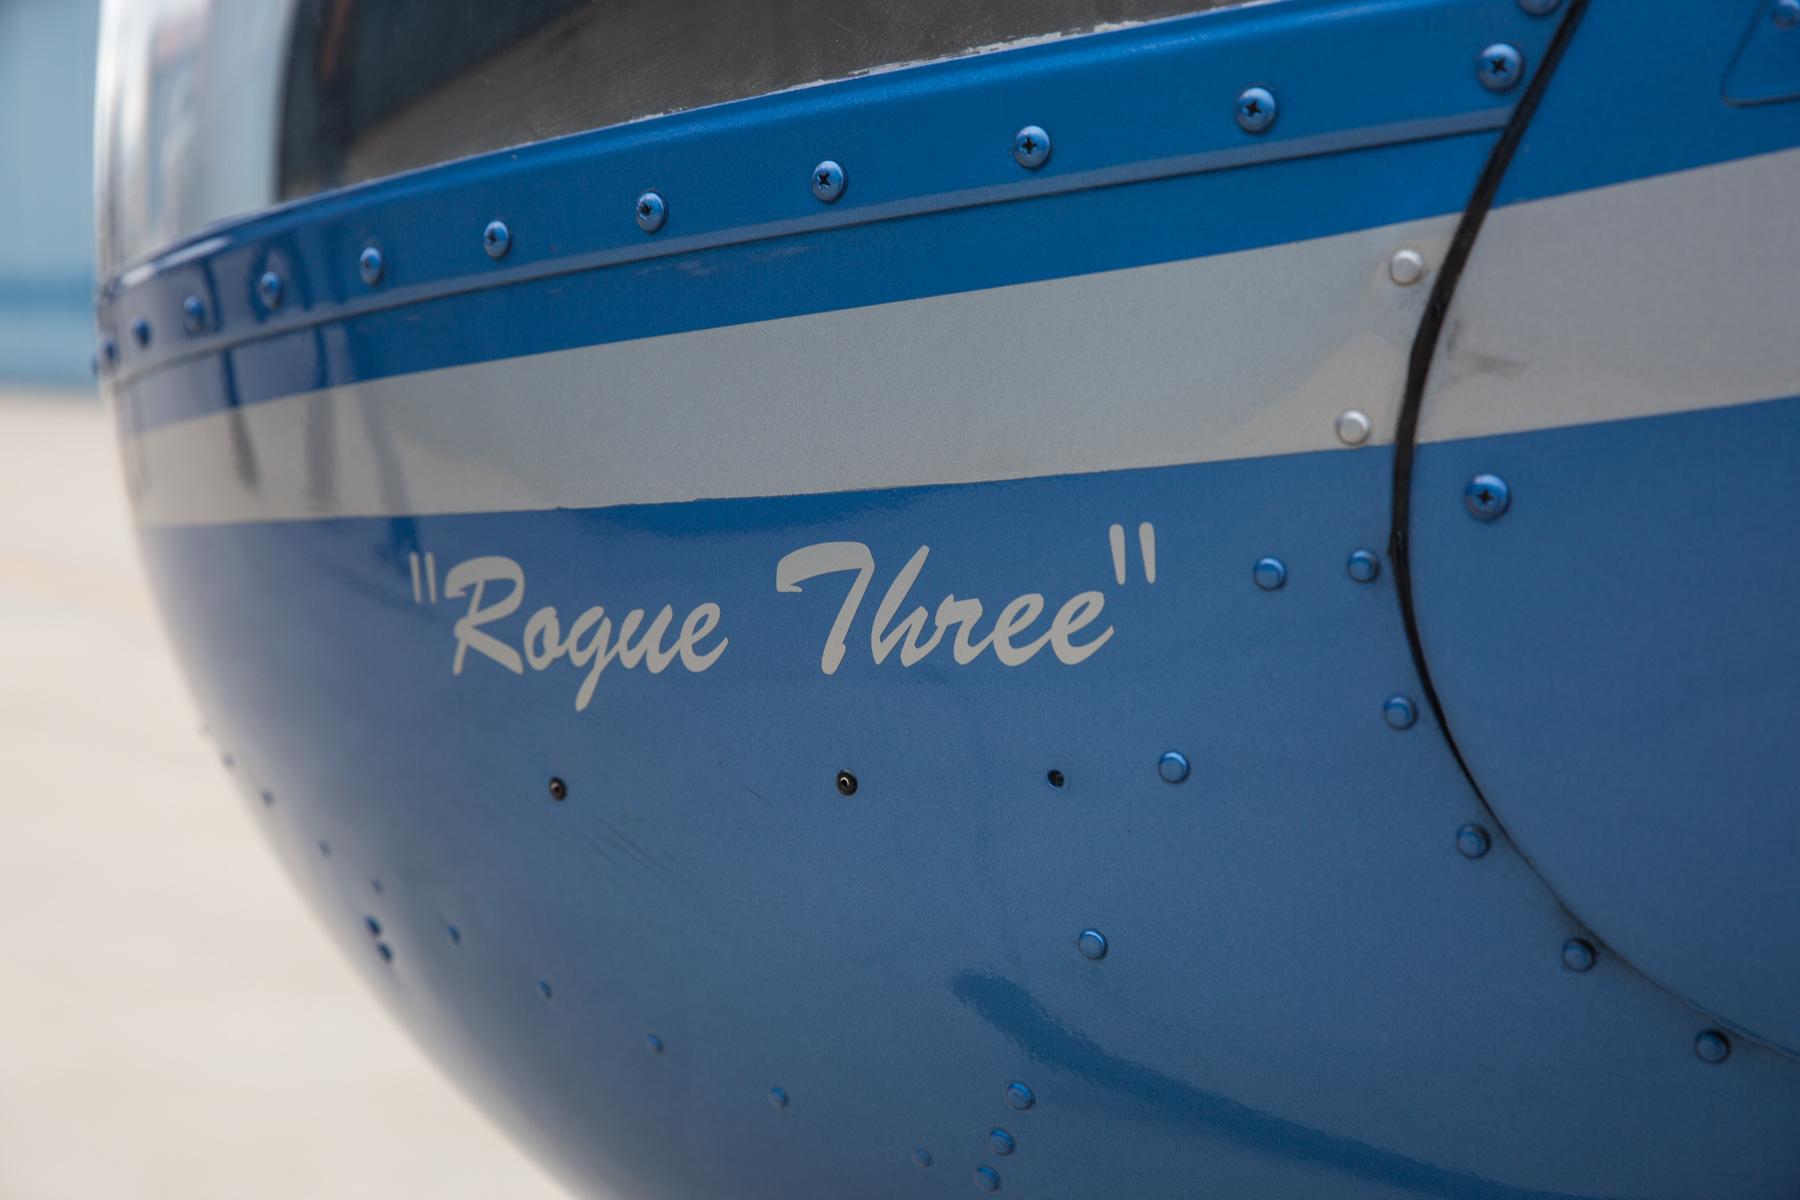 Rogue Three, aka Blue Steel - ◾️R22 Beta II.◾️Seats two.◾️Lycoming O-360-B2C piston engine.◾️Maximum Gross Weight: 1370 lb.◾️Great for training.